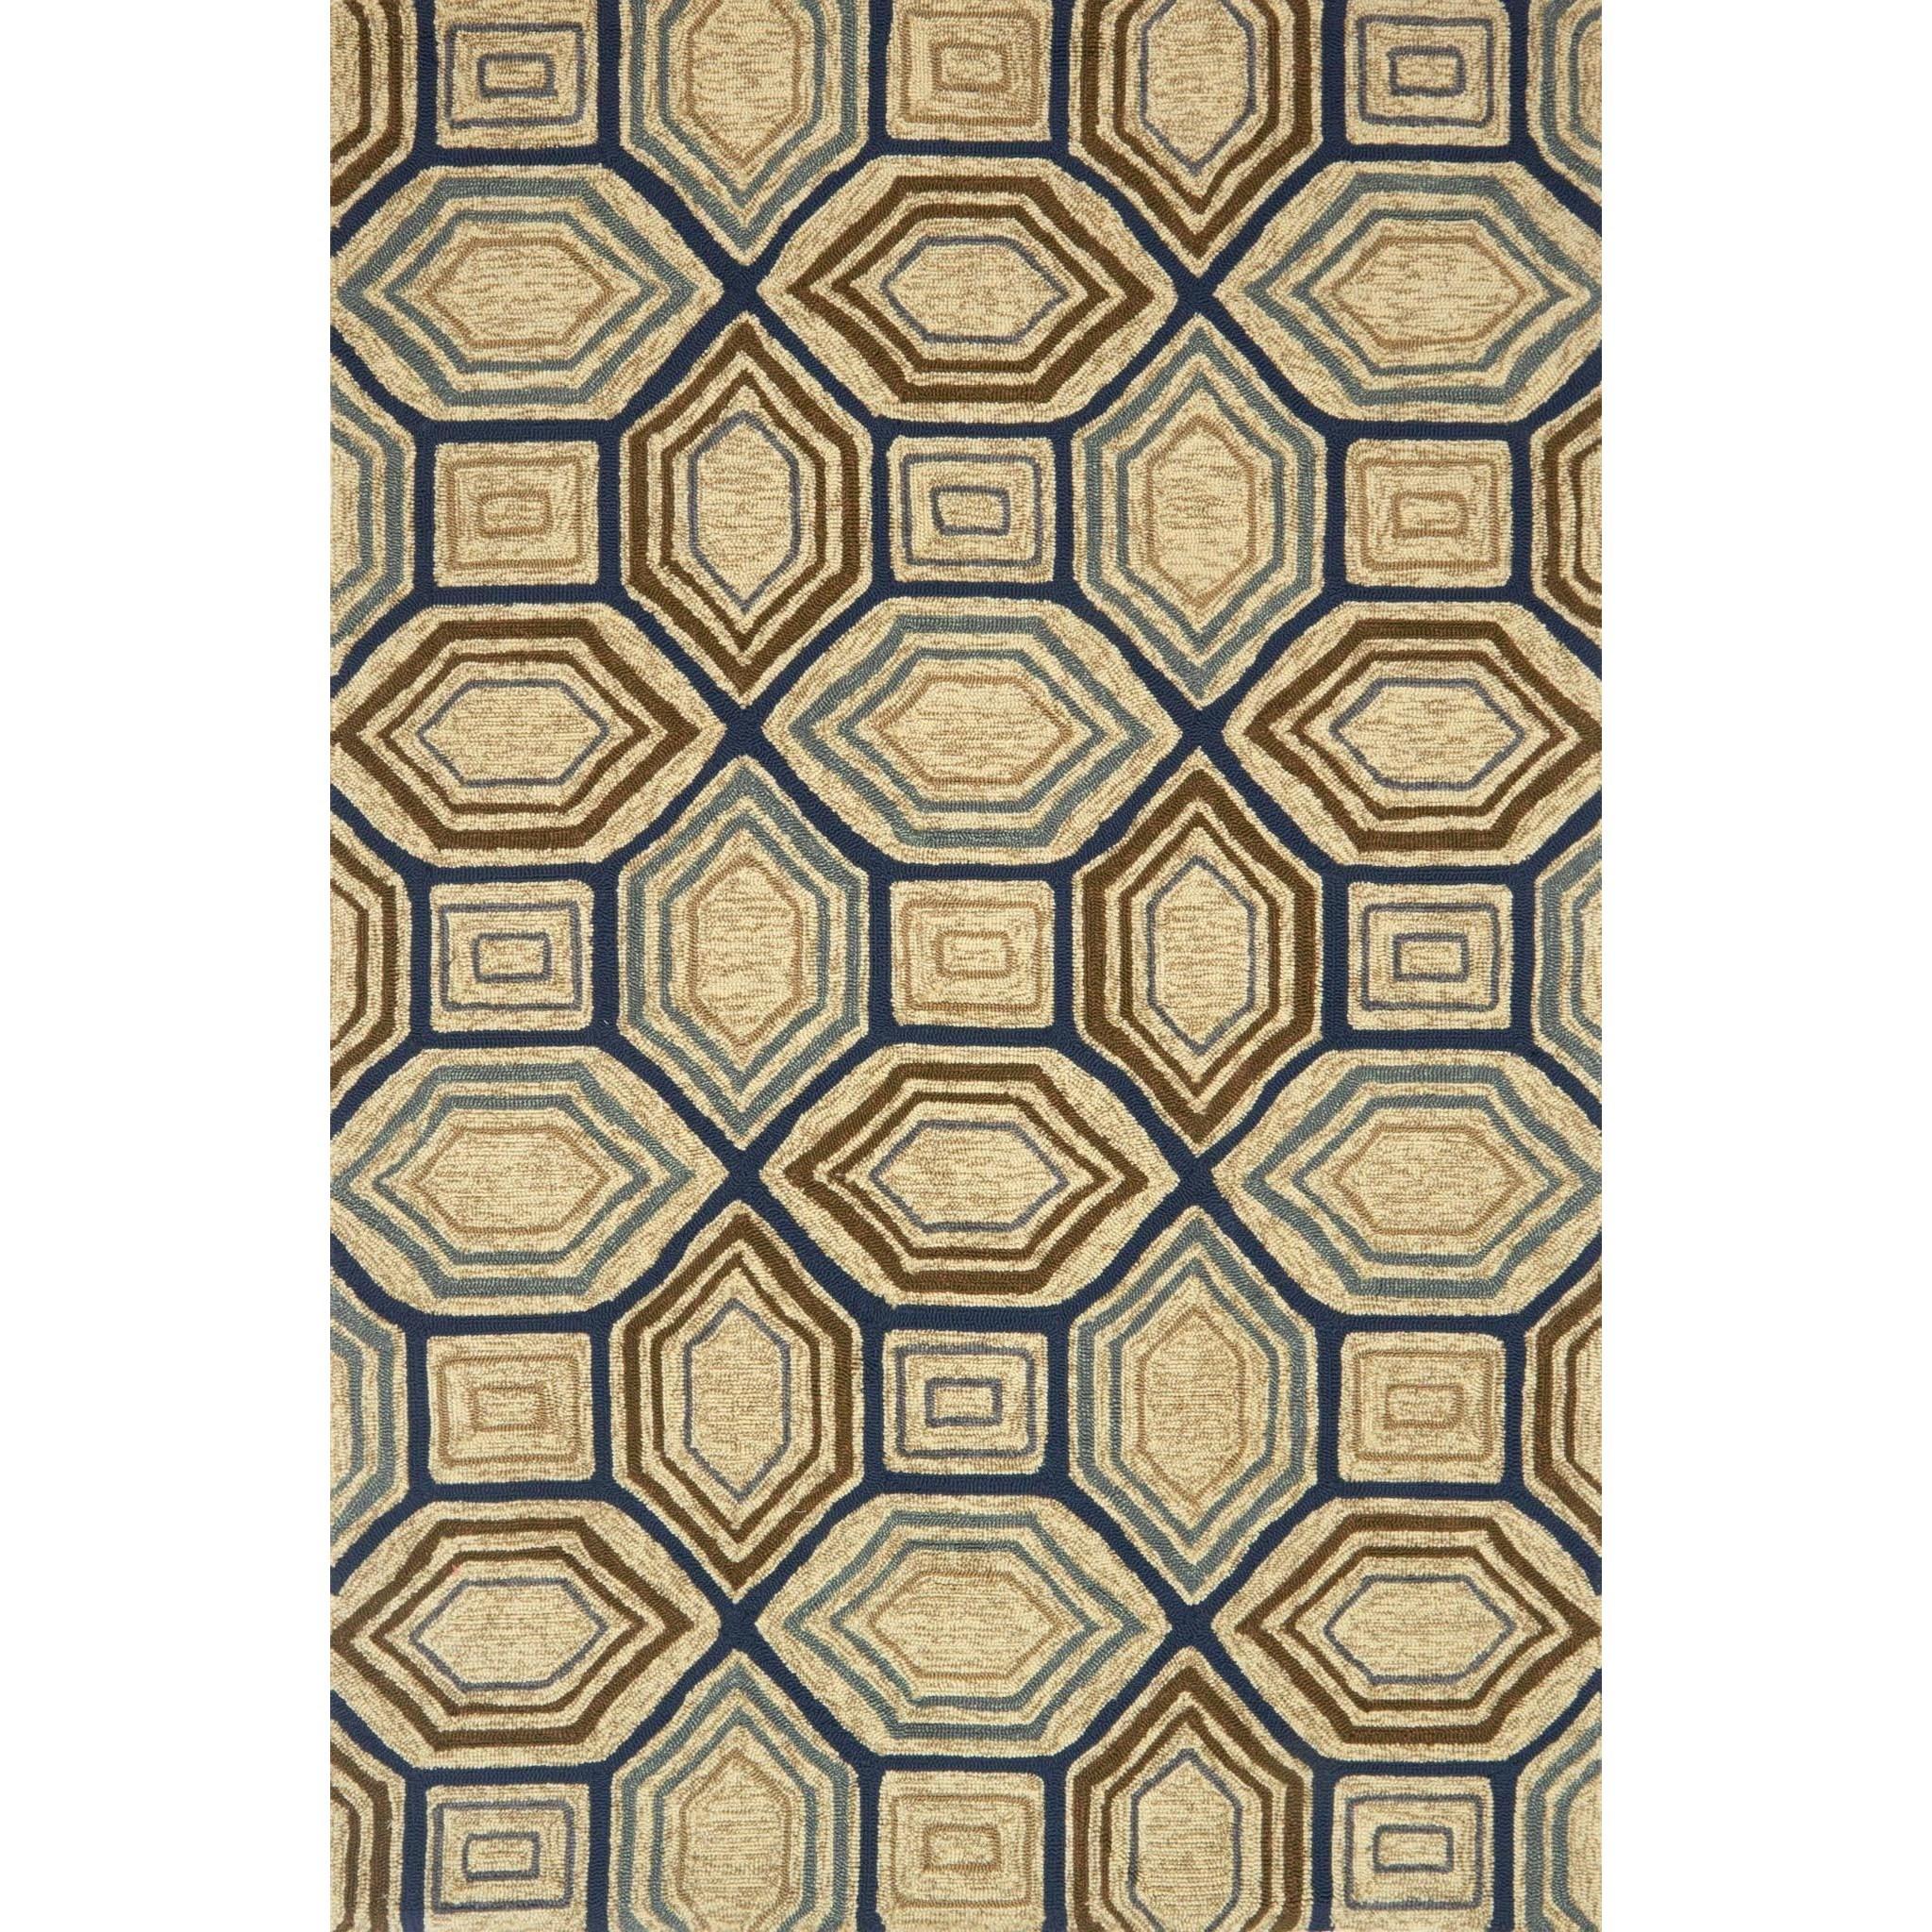 homey rugs outdoor indoor ravishing blue runner rugsgreen designs rug green and beach floor